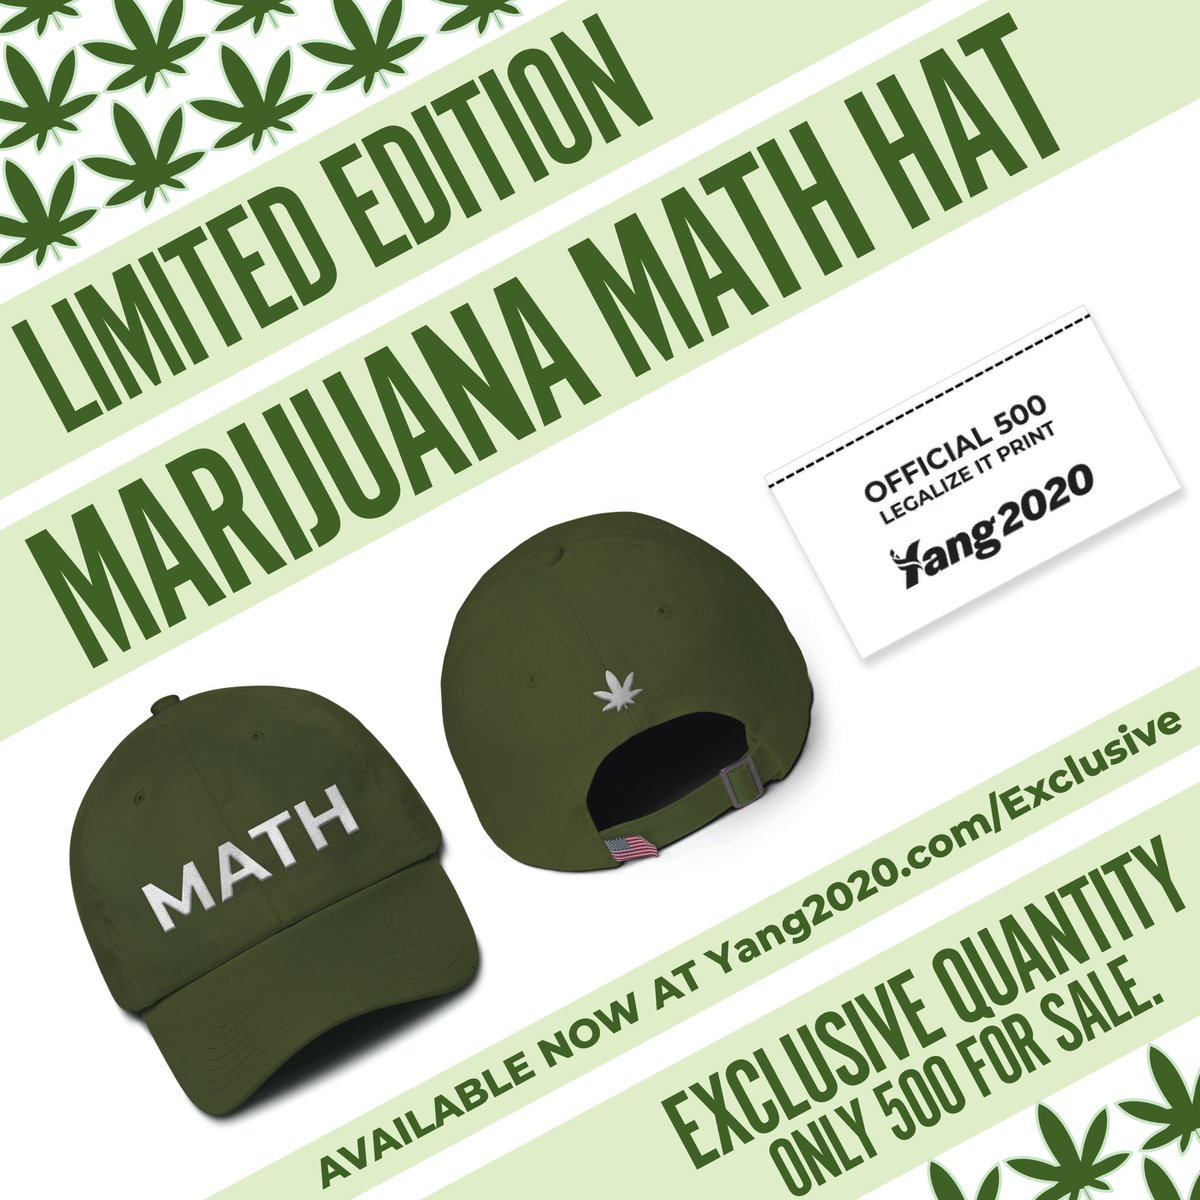 Andrew Yang Peddles Marijuana-Themed Presidential Campaign Merchandise